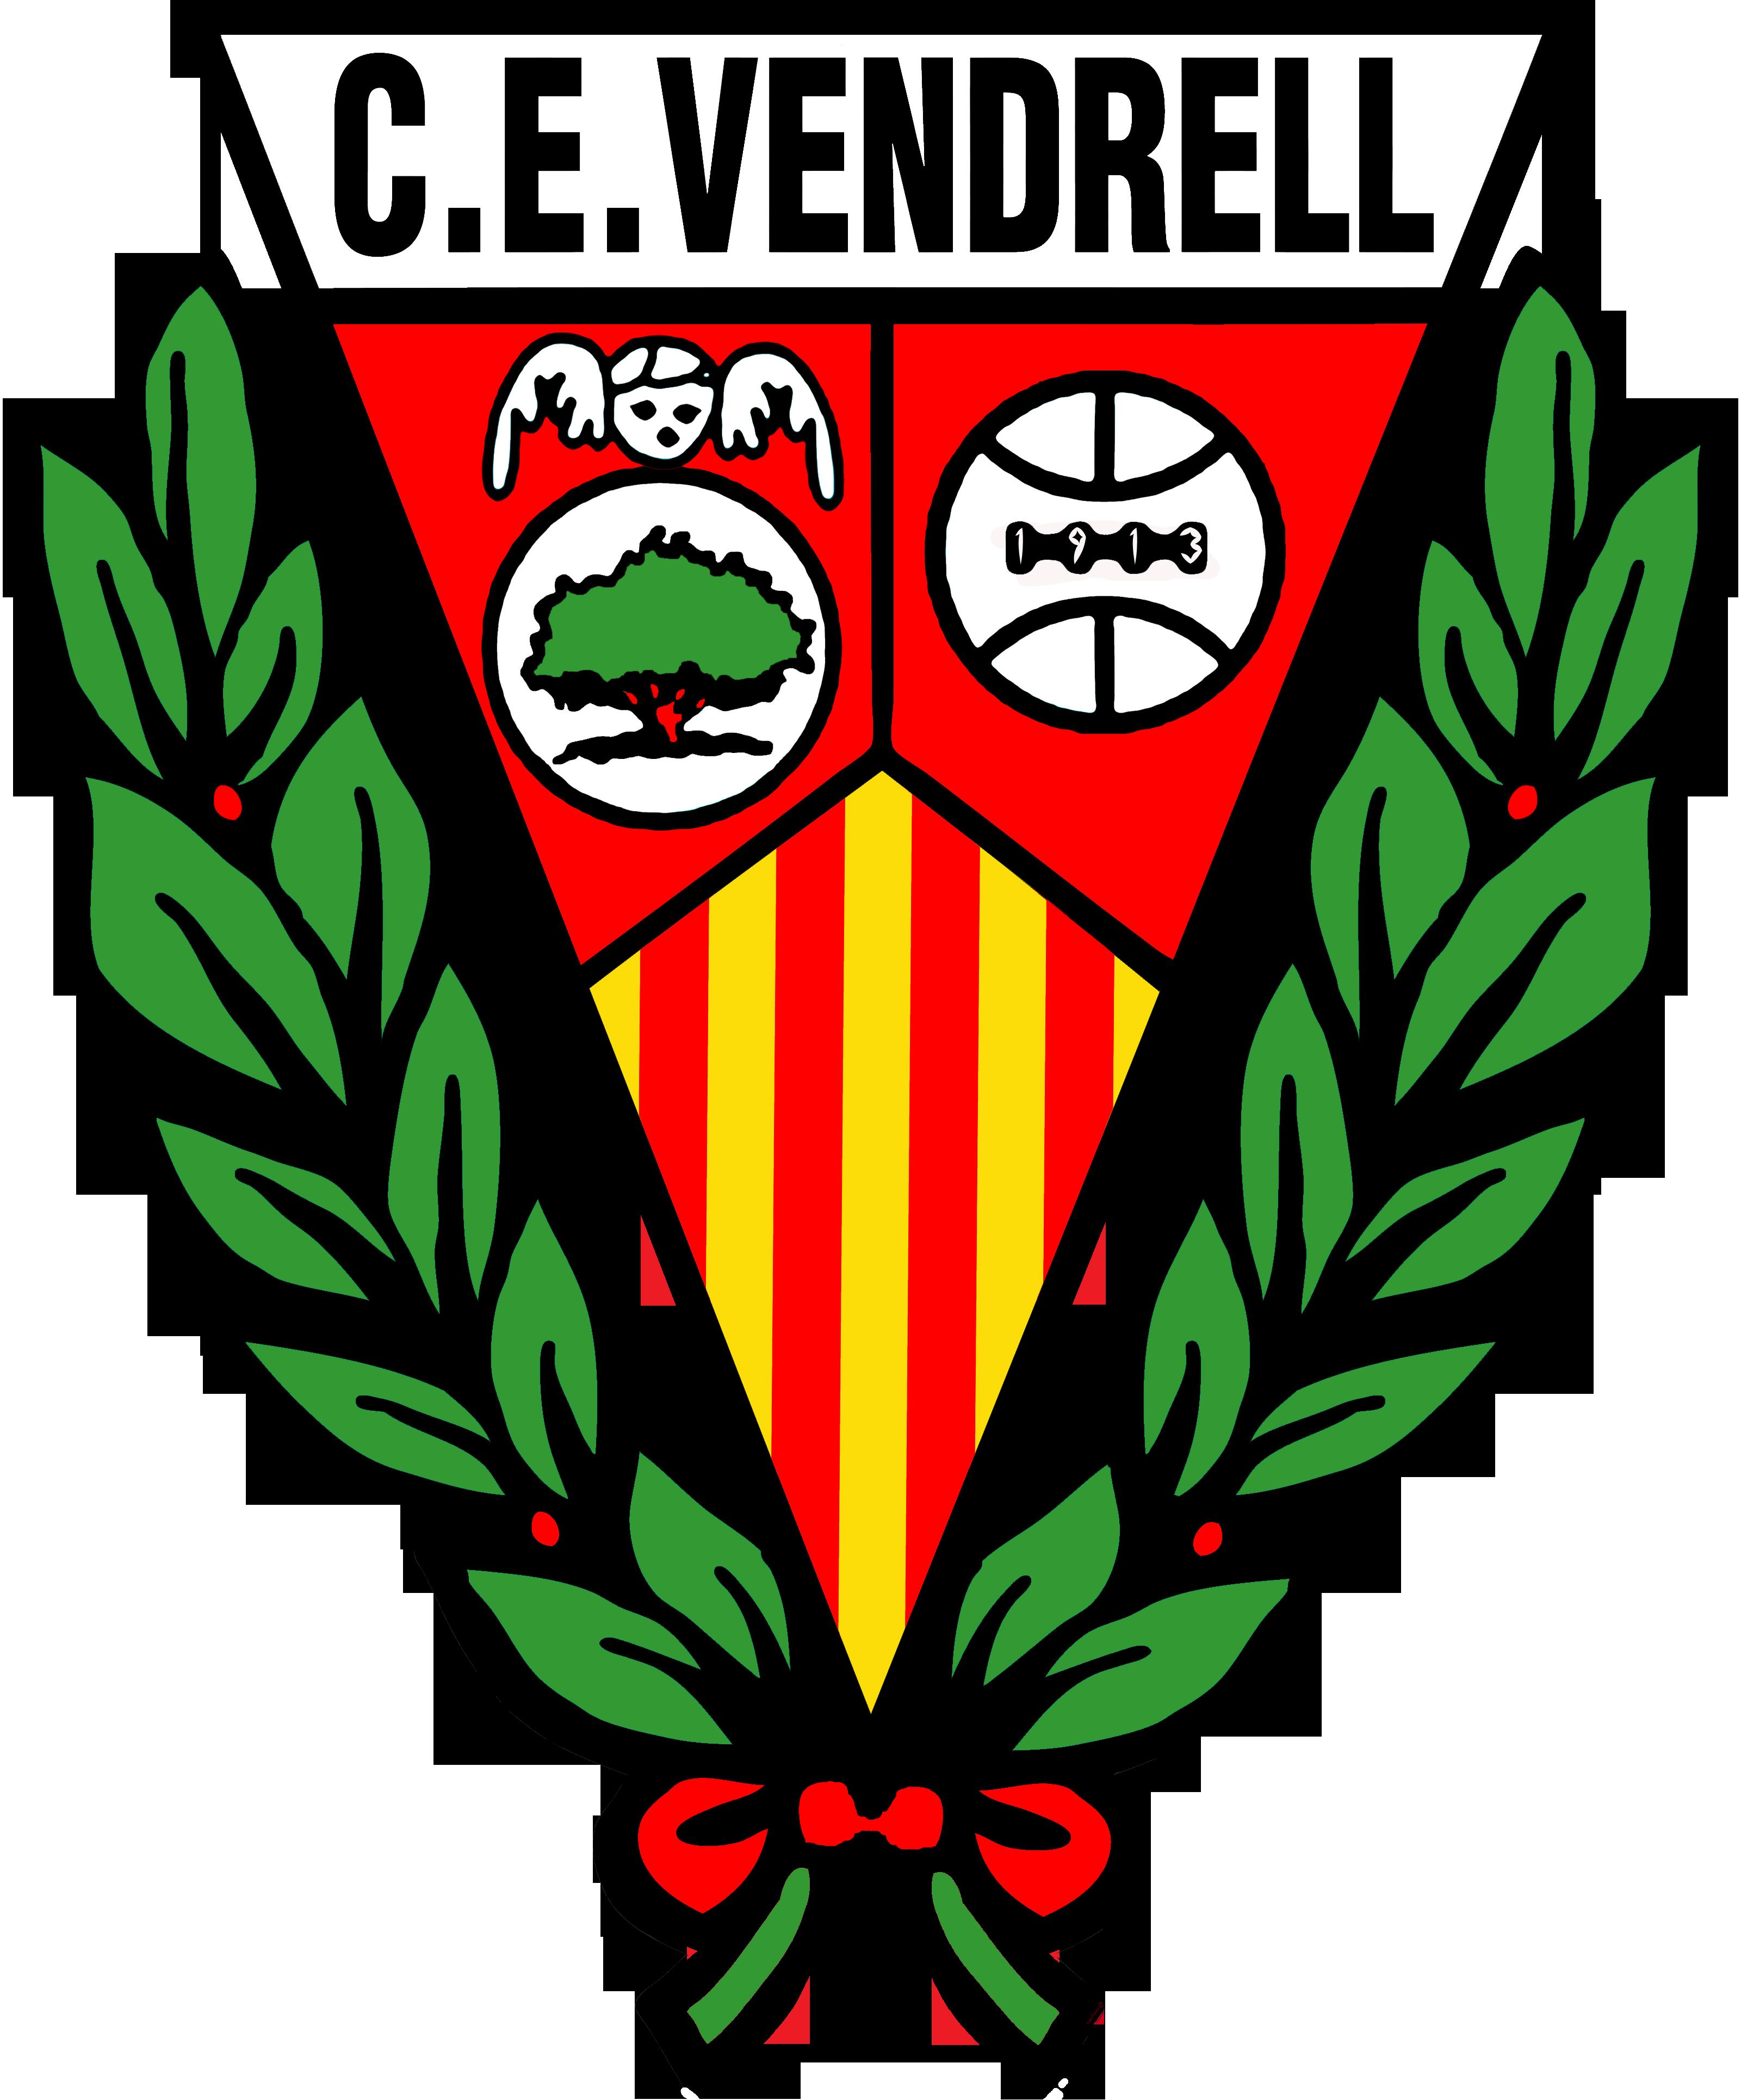 C.E. Vendrell Benjami A